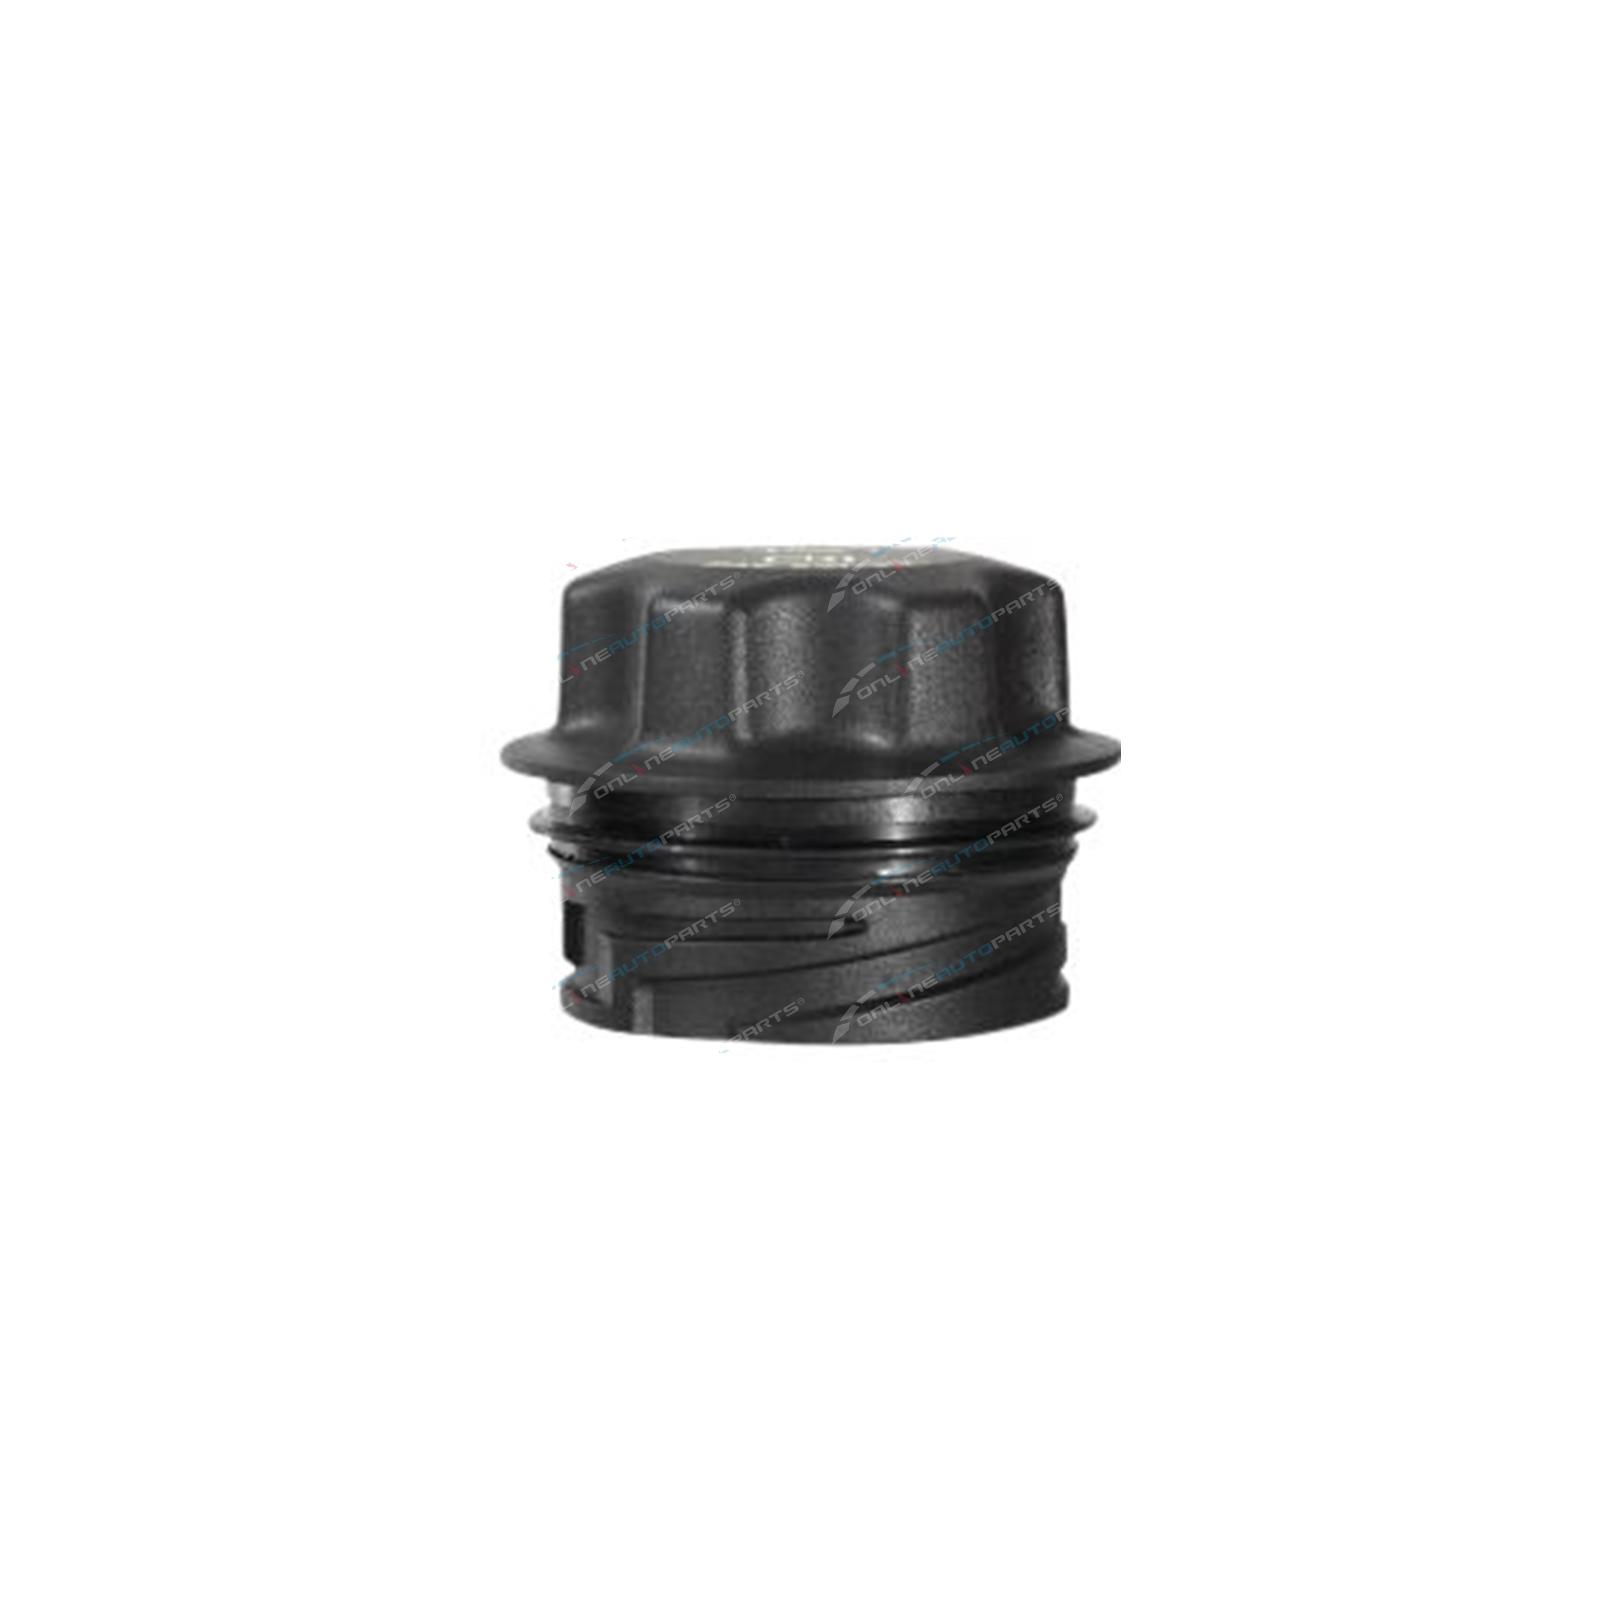 TOC531 - Engine Oil Cap Plastic push and turn - Tridon